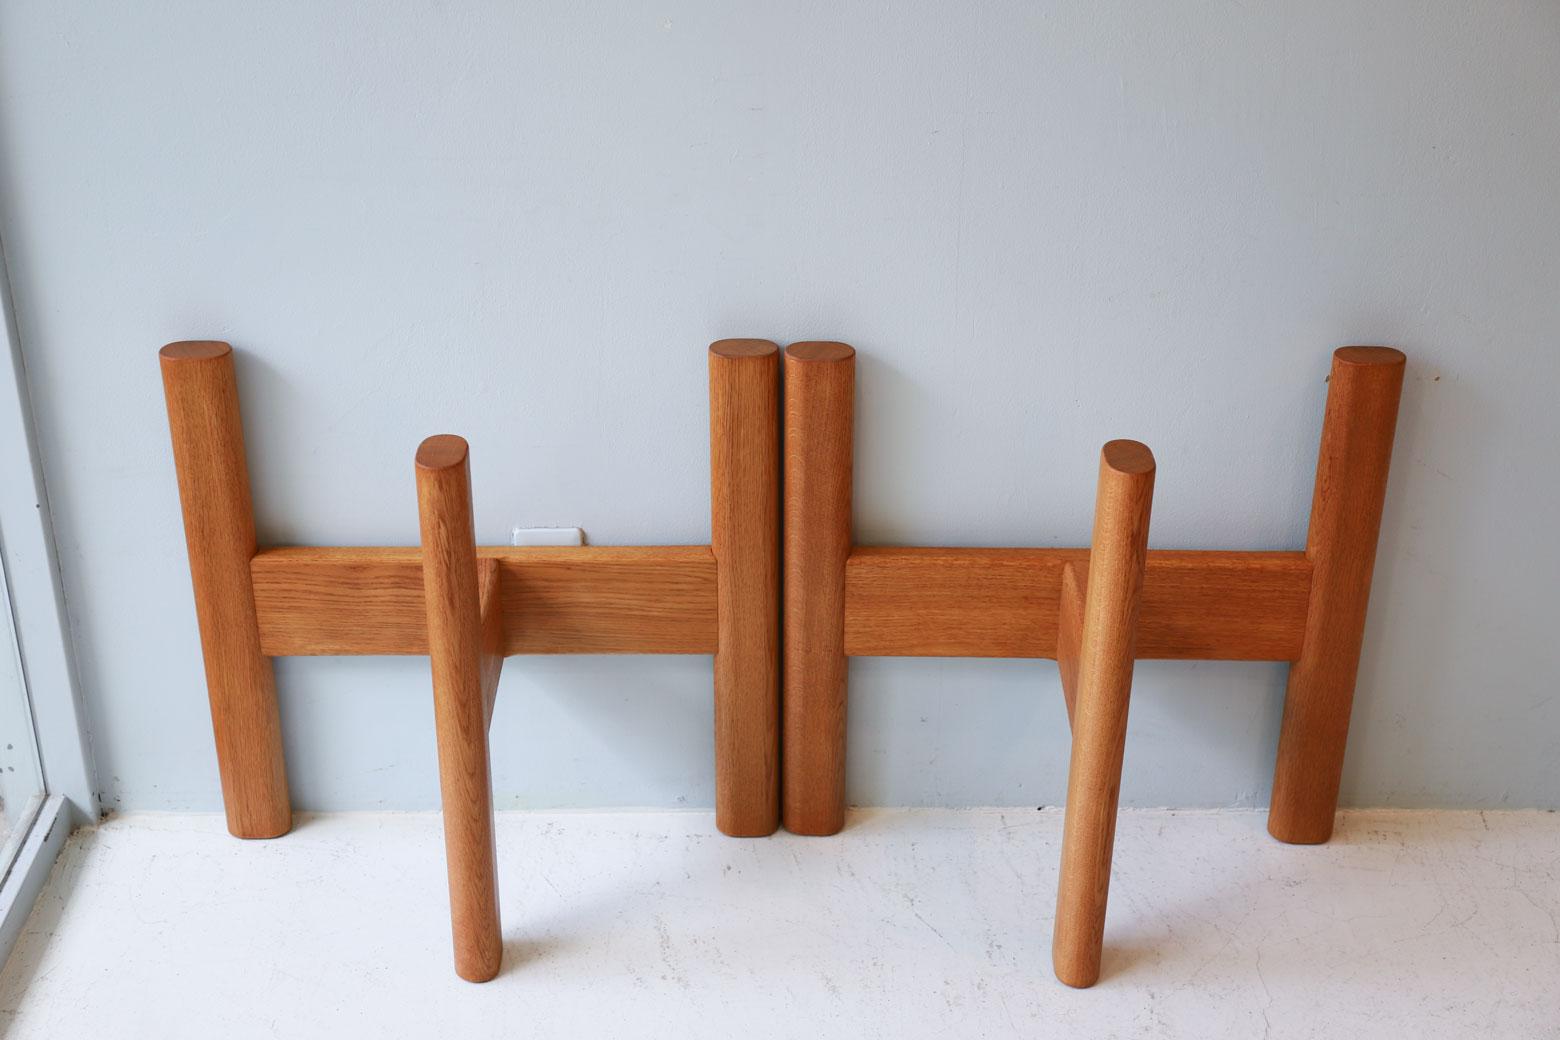 Japan Craft 2way Center Table/座卓・ダイニングにもなる角テーブル 北欧インテリア